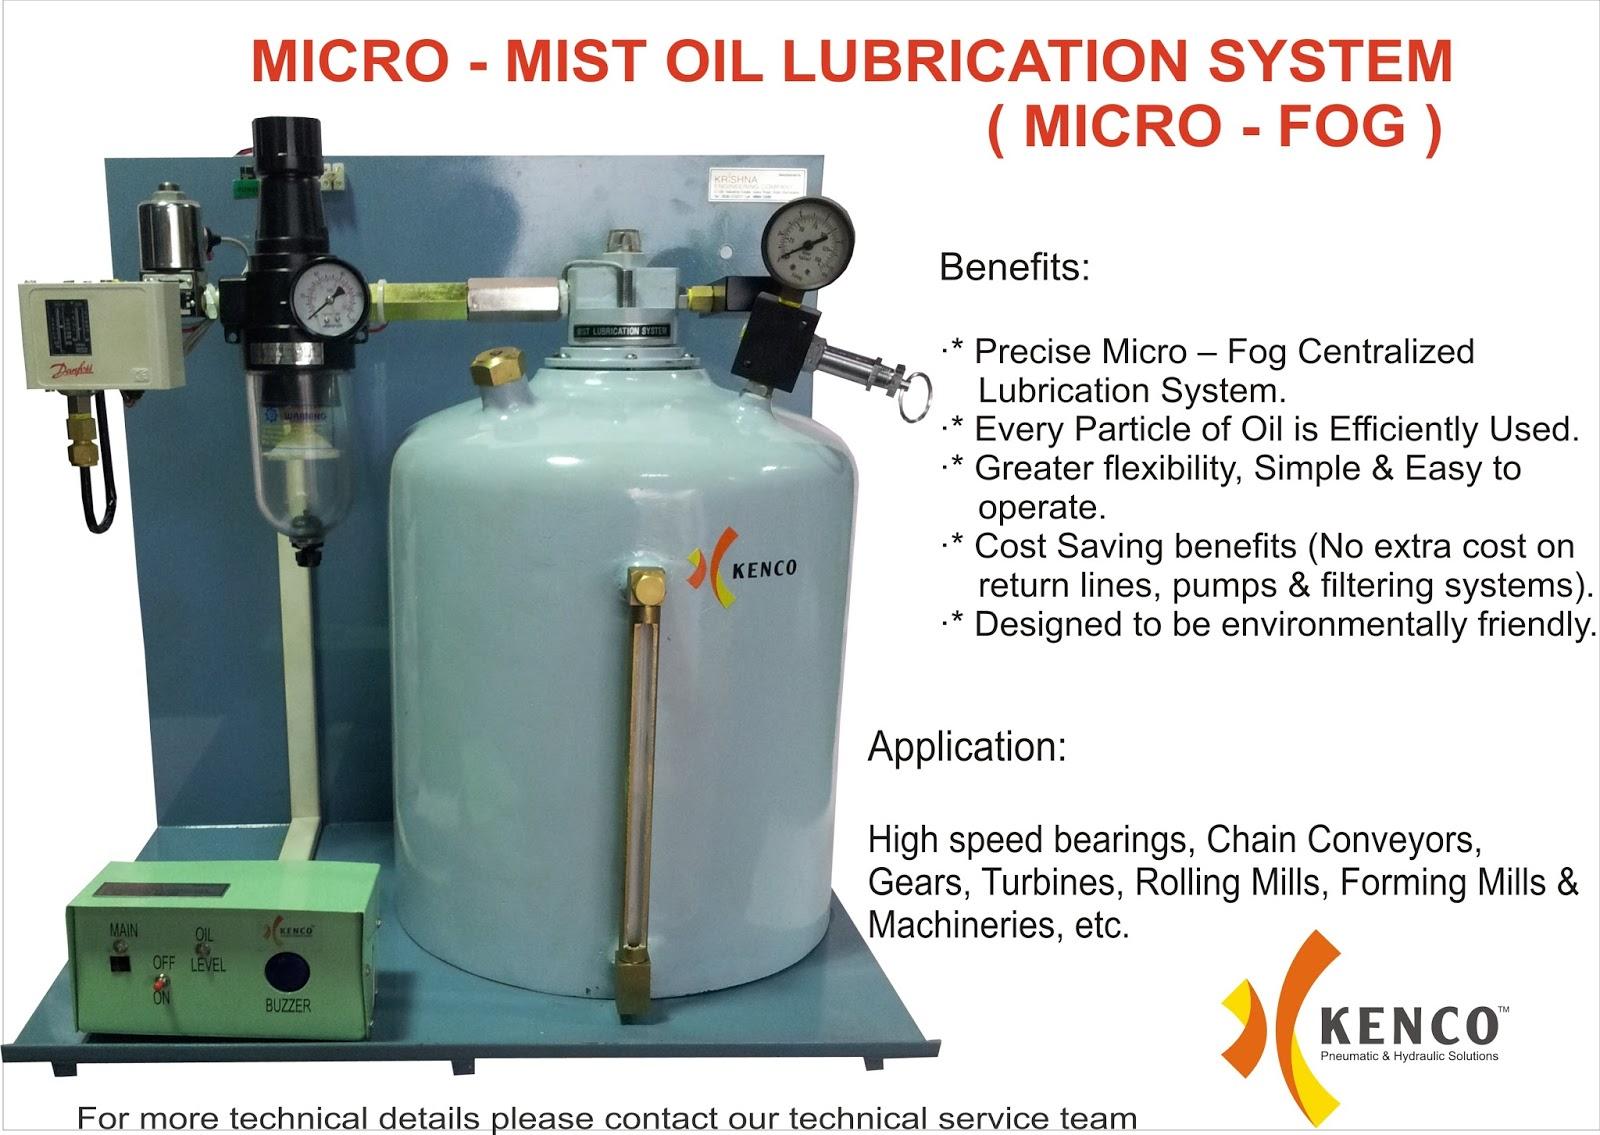 Micro Mist Oil Lubrication System Micro Fog